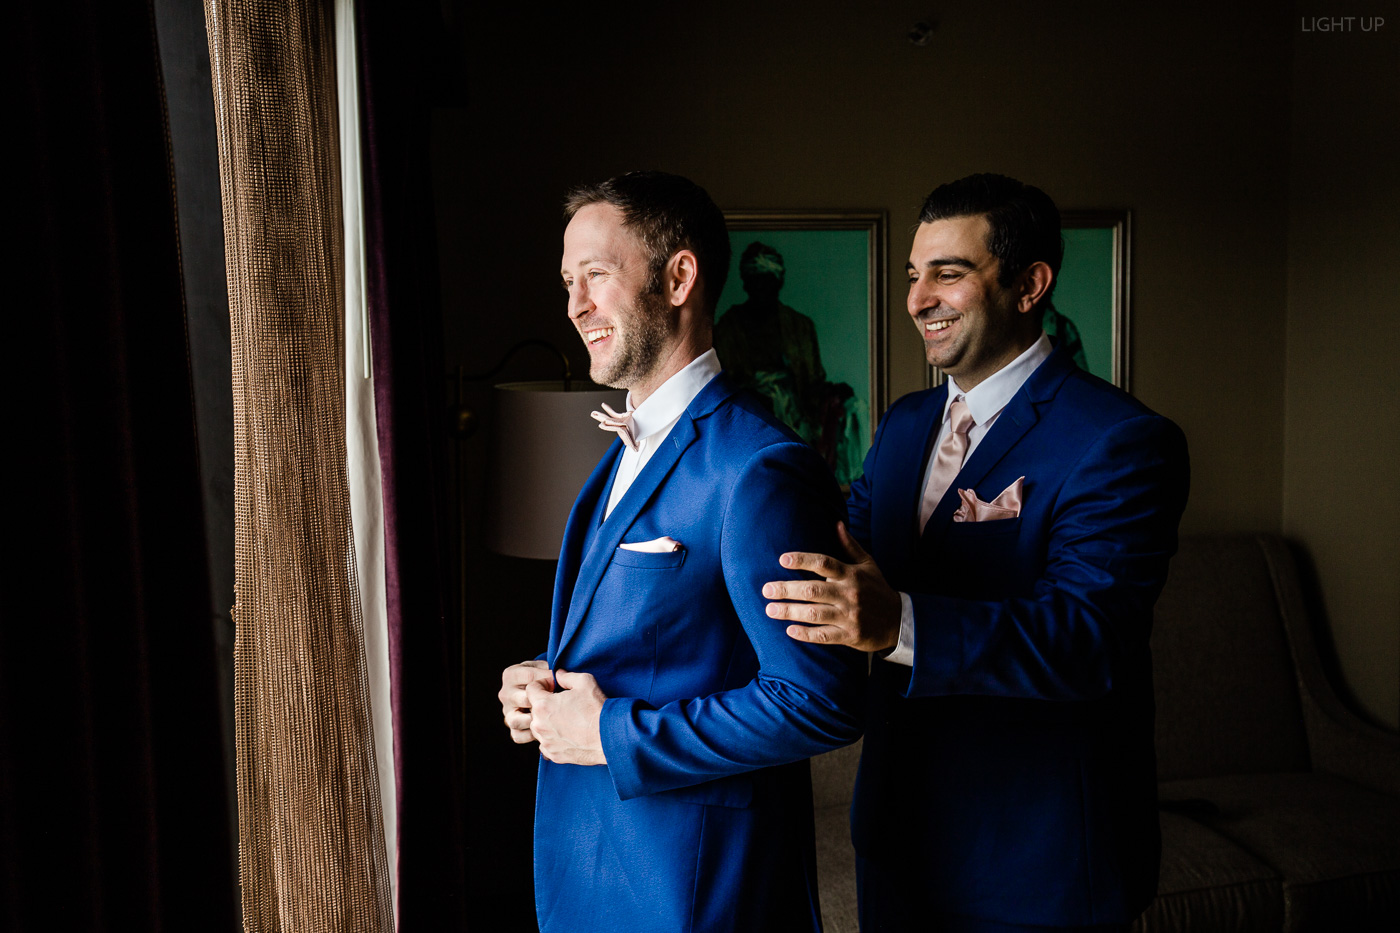 Grand-Bohemian-Hotel-Wedding-in-Orlando-18.jpg